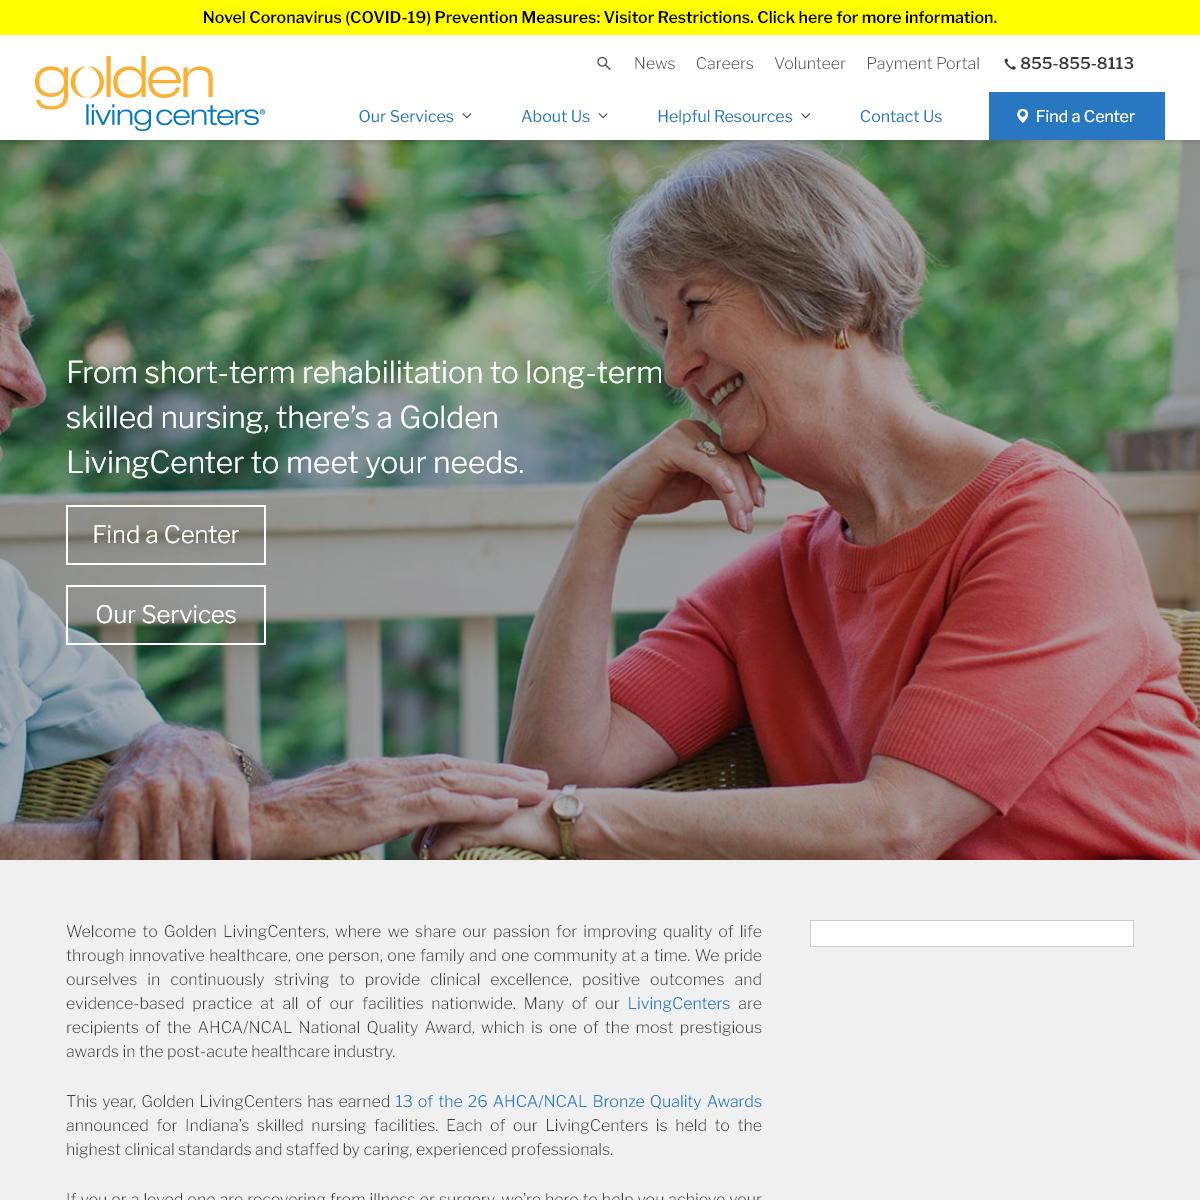 Golden LivingCenters - Enhancing Lives Through Innovative Healthcare